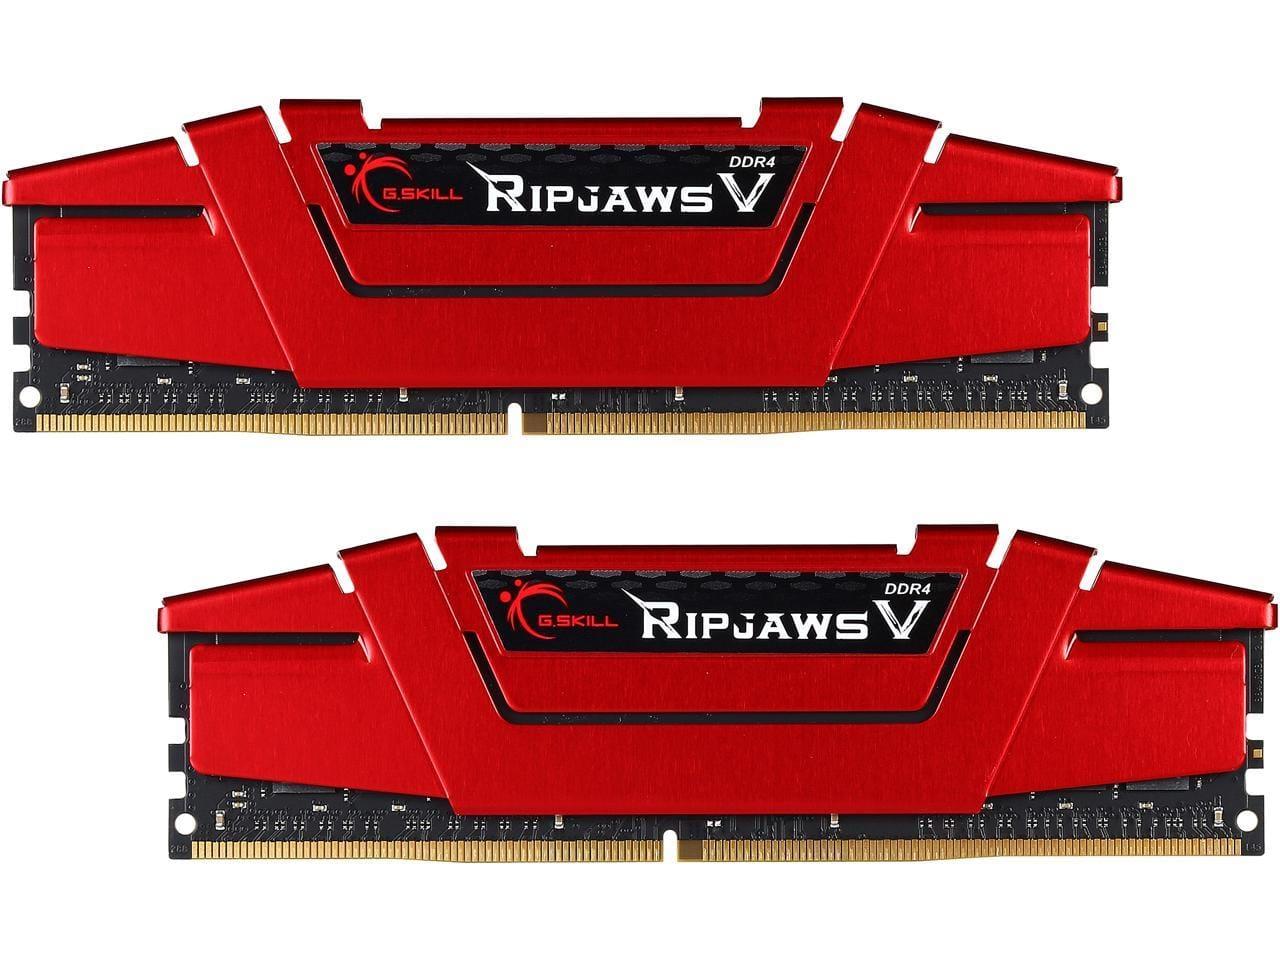 32GB (2x16GB) G.SKILL Ripjaws V Series DDR4 3200 Desktop Memory